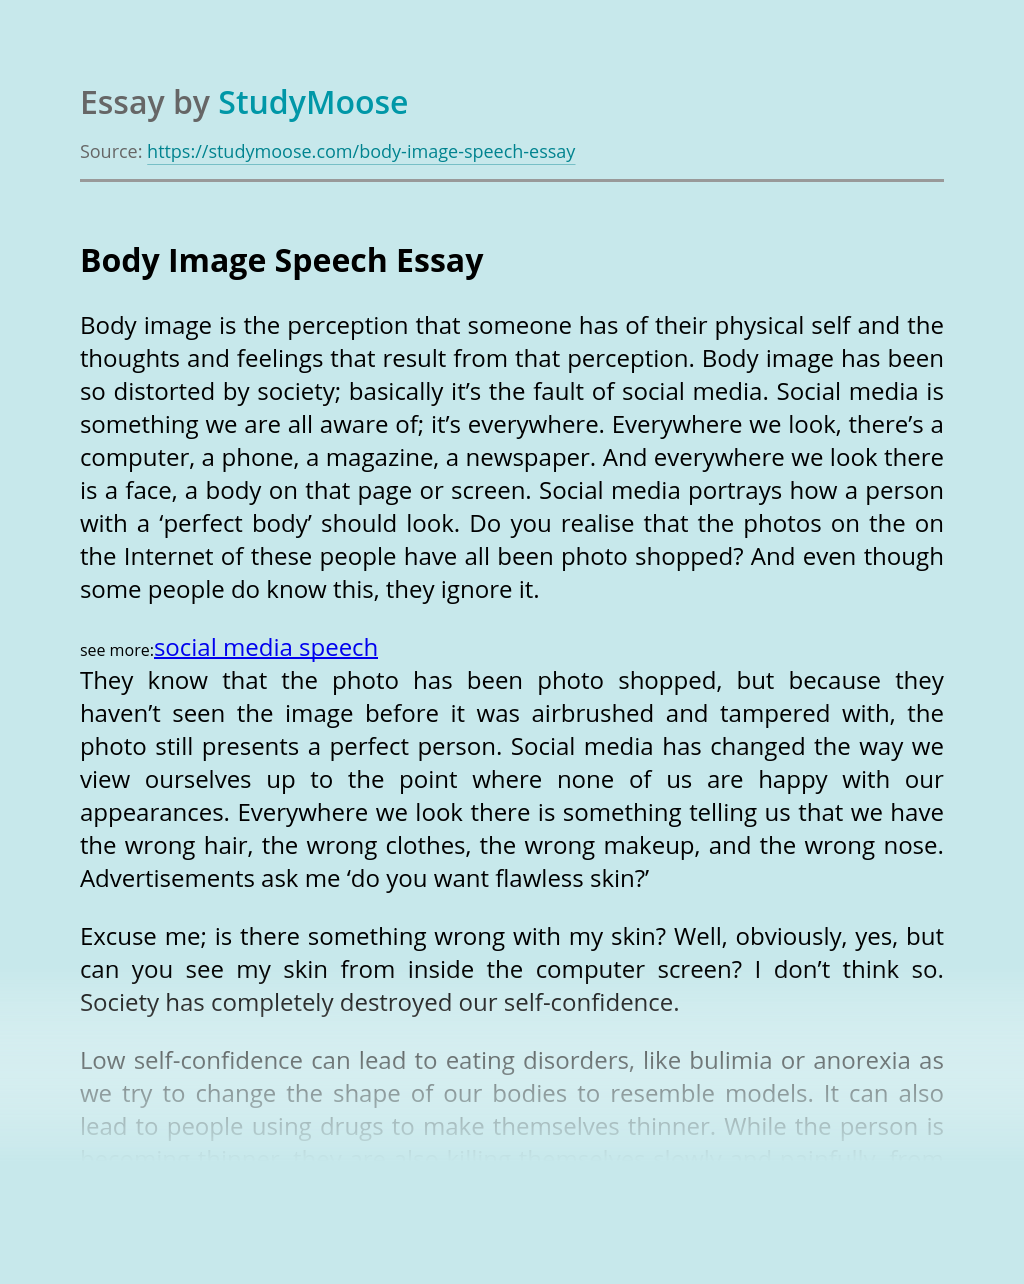 Body Image Speech